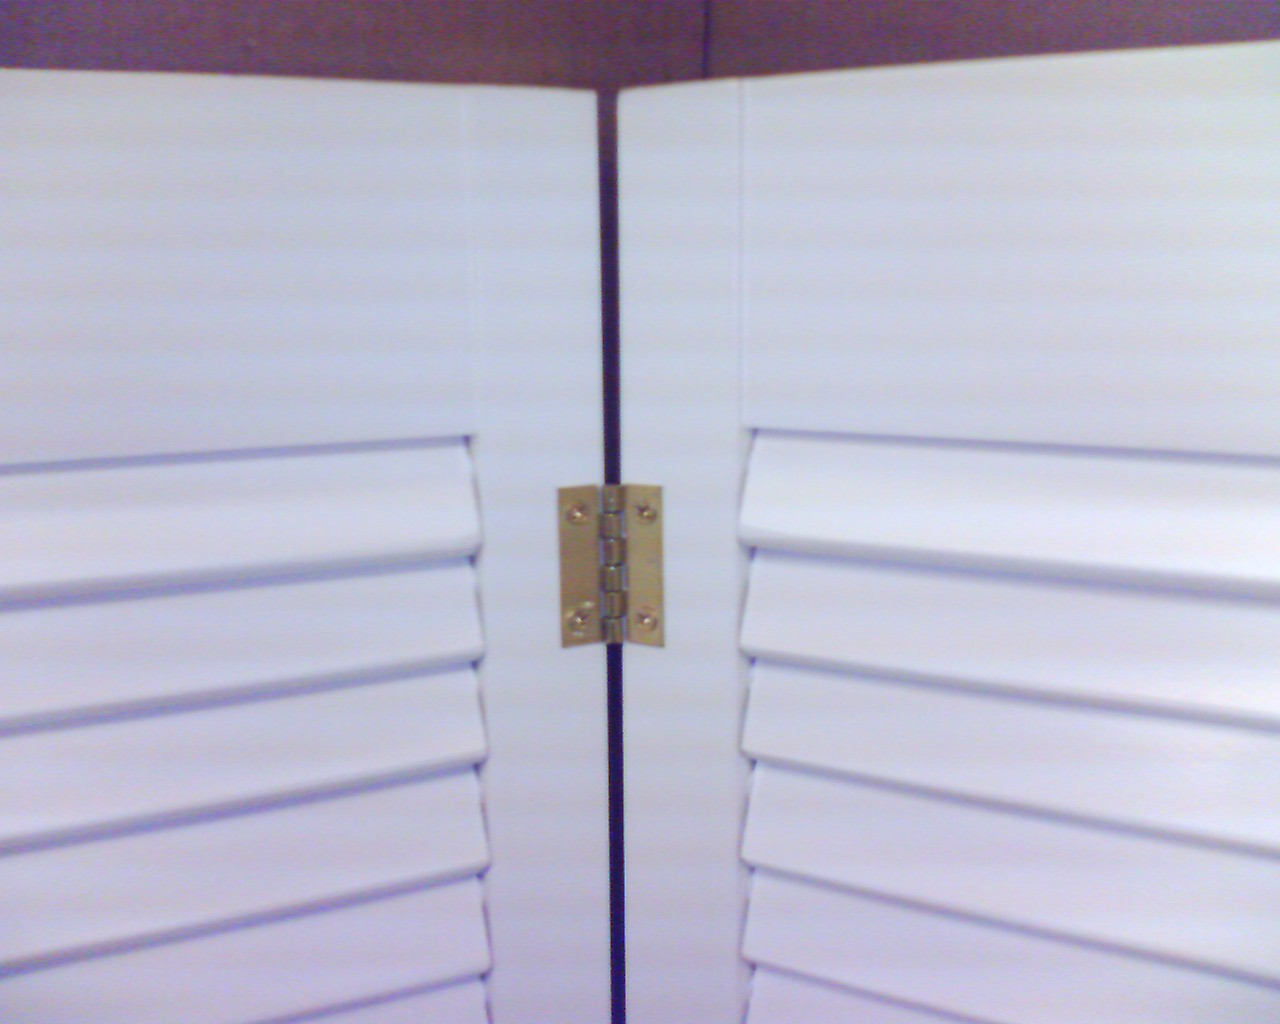 Cabinet Hinges Door Hinges Gate Hinges and more - HardwareSource.com & LAUNDRY HAMPER DOOR CABINET TOP HINGE PUSH | Cabinet Doors pezcame.com